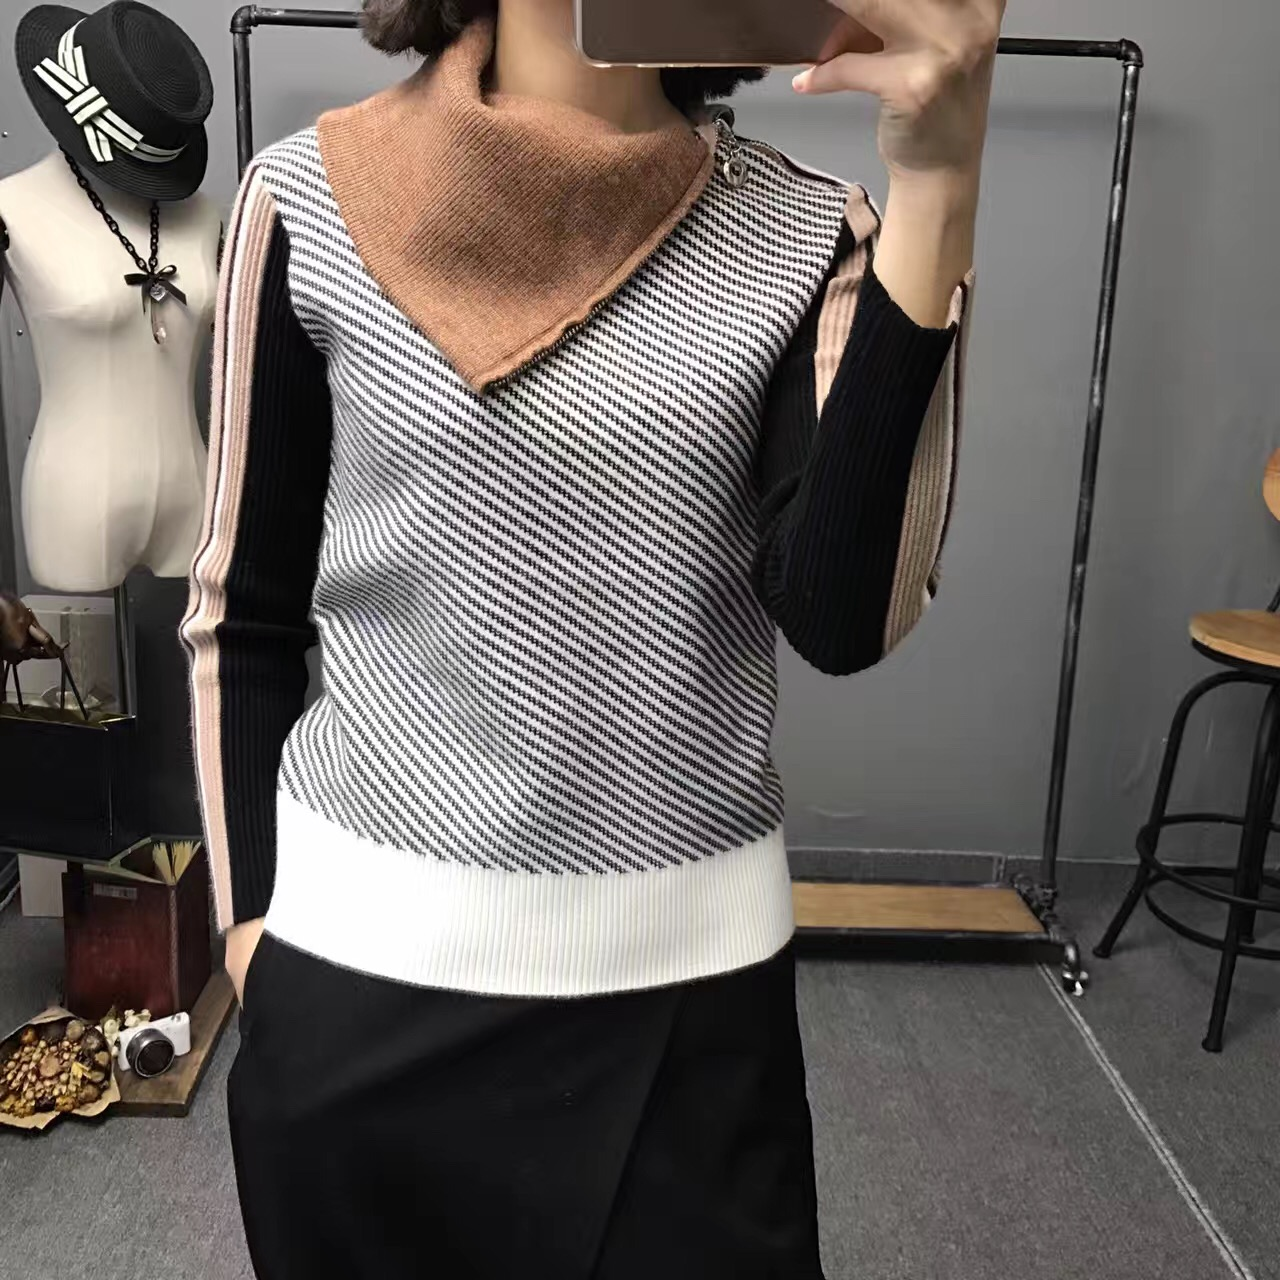 2017 New New Arrival Fashion Microfiber Full Pullover font b Men b font Side Downneck Female